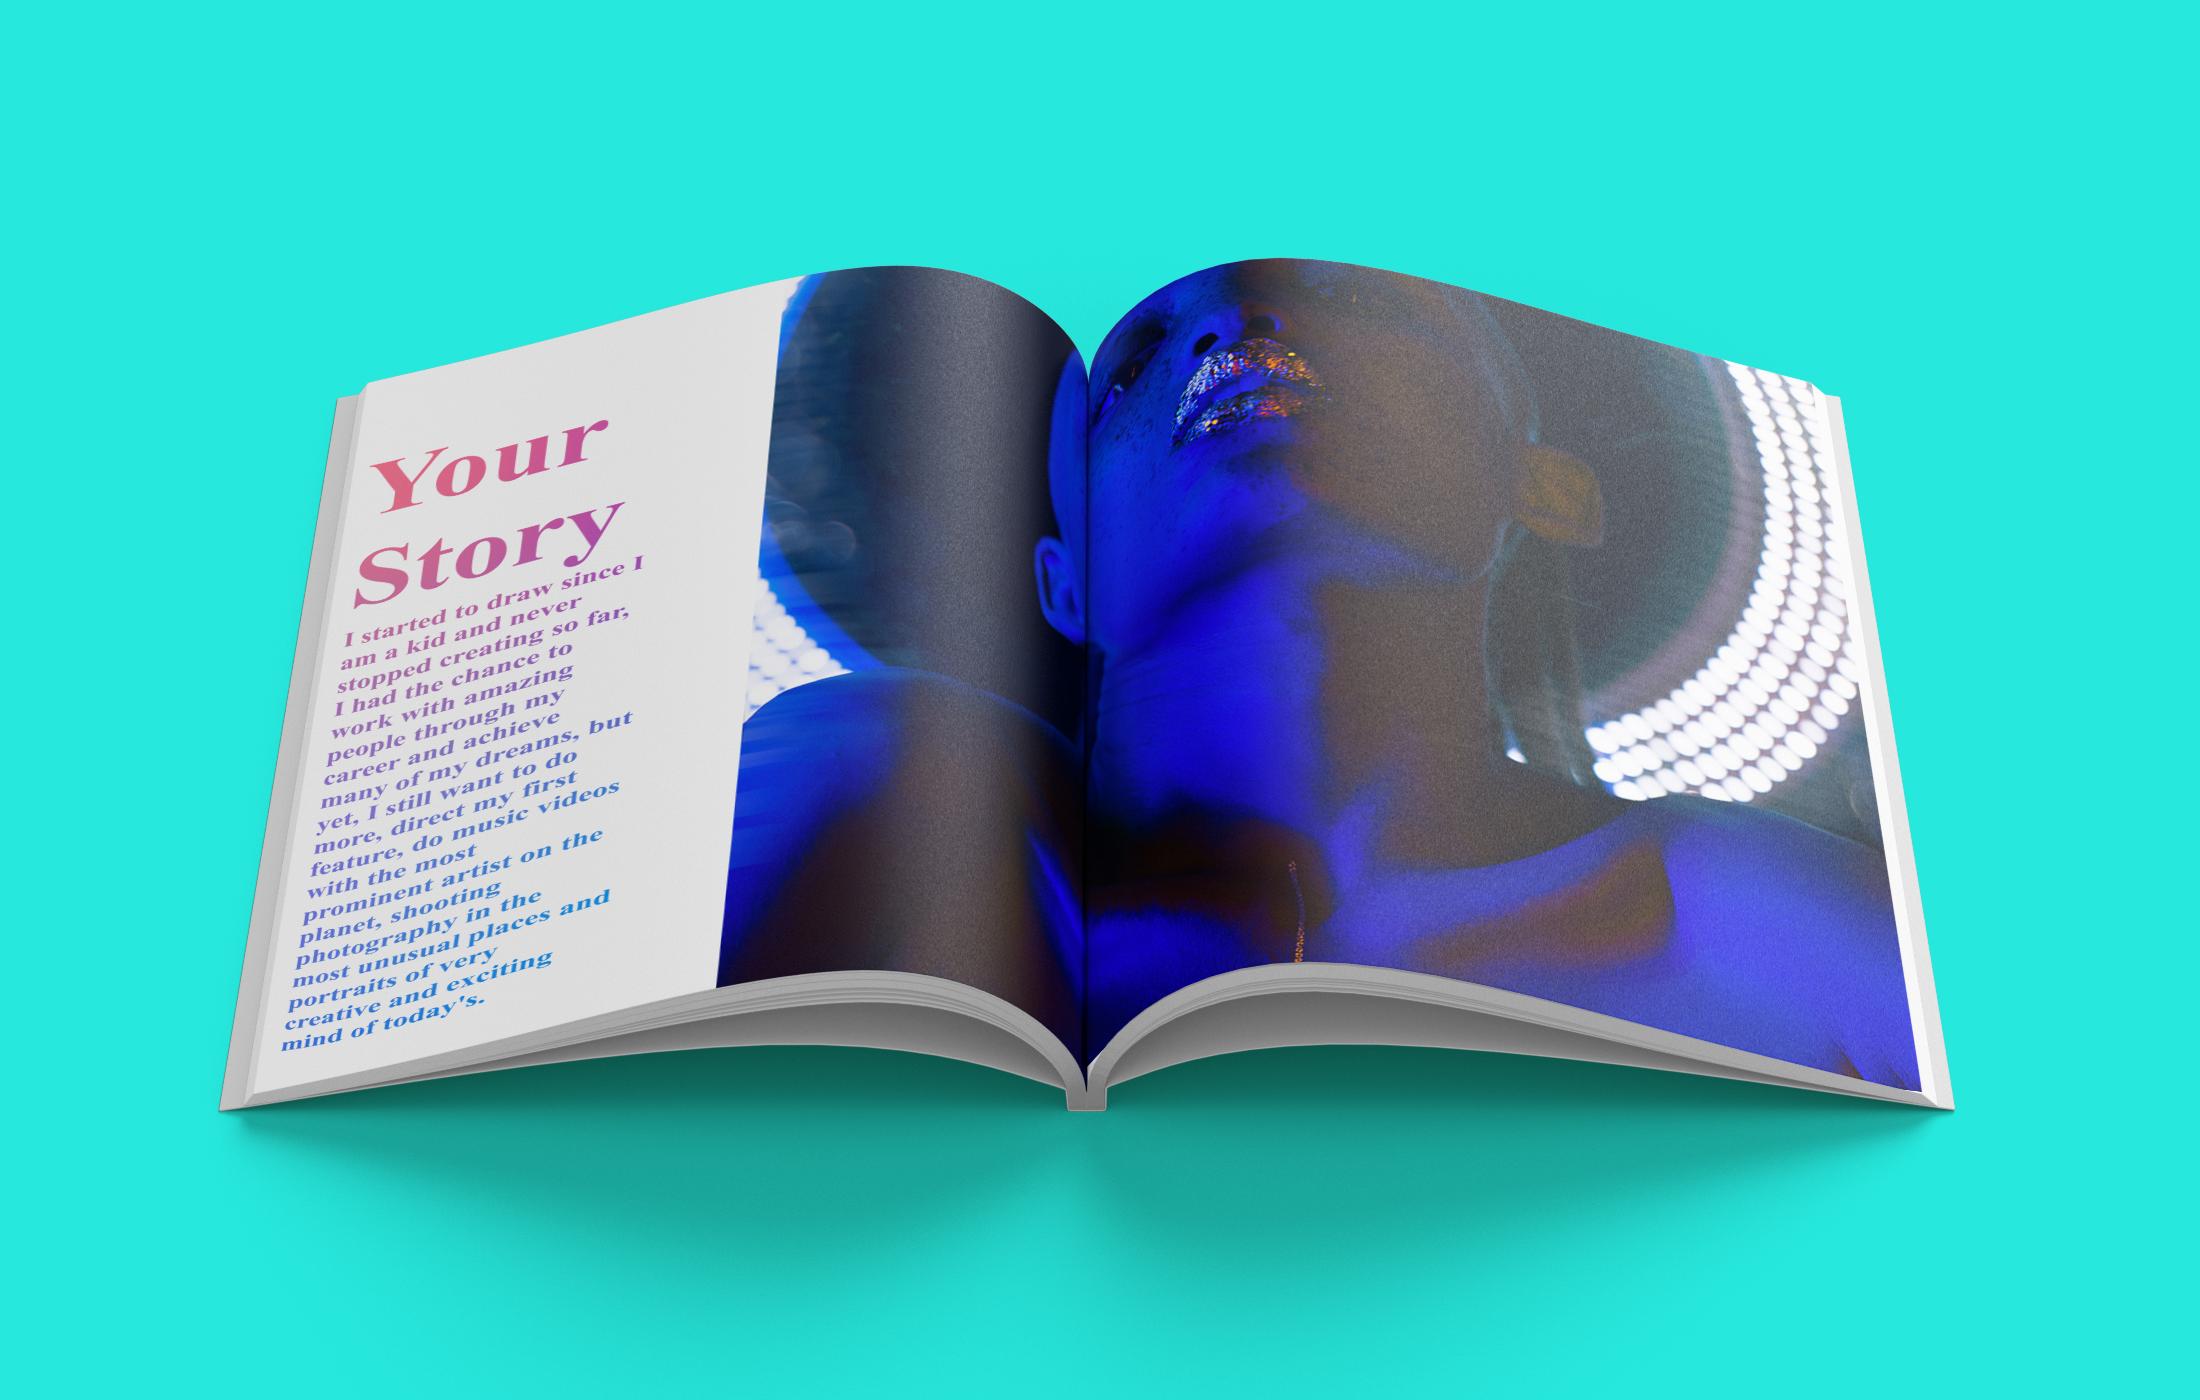 Model Citizen Magazine Issue 30, Macky Suson, Fashion Inclusion Now3.png